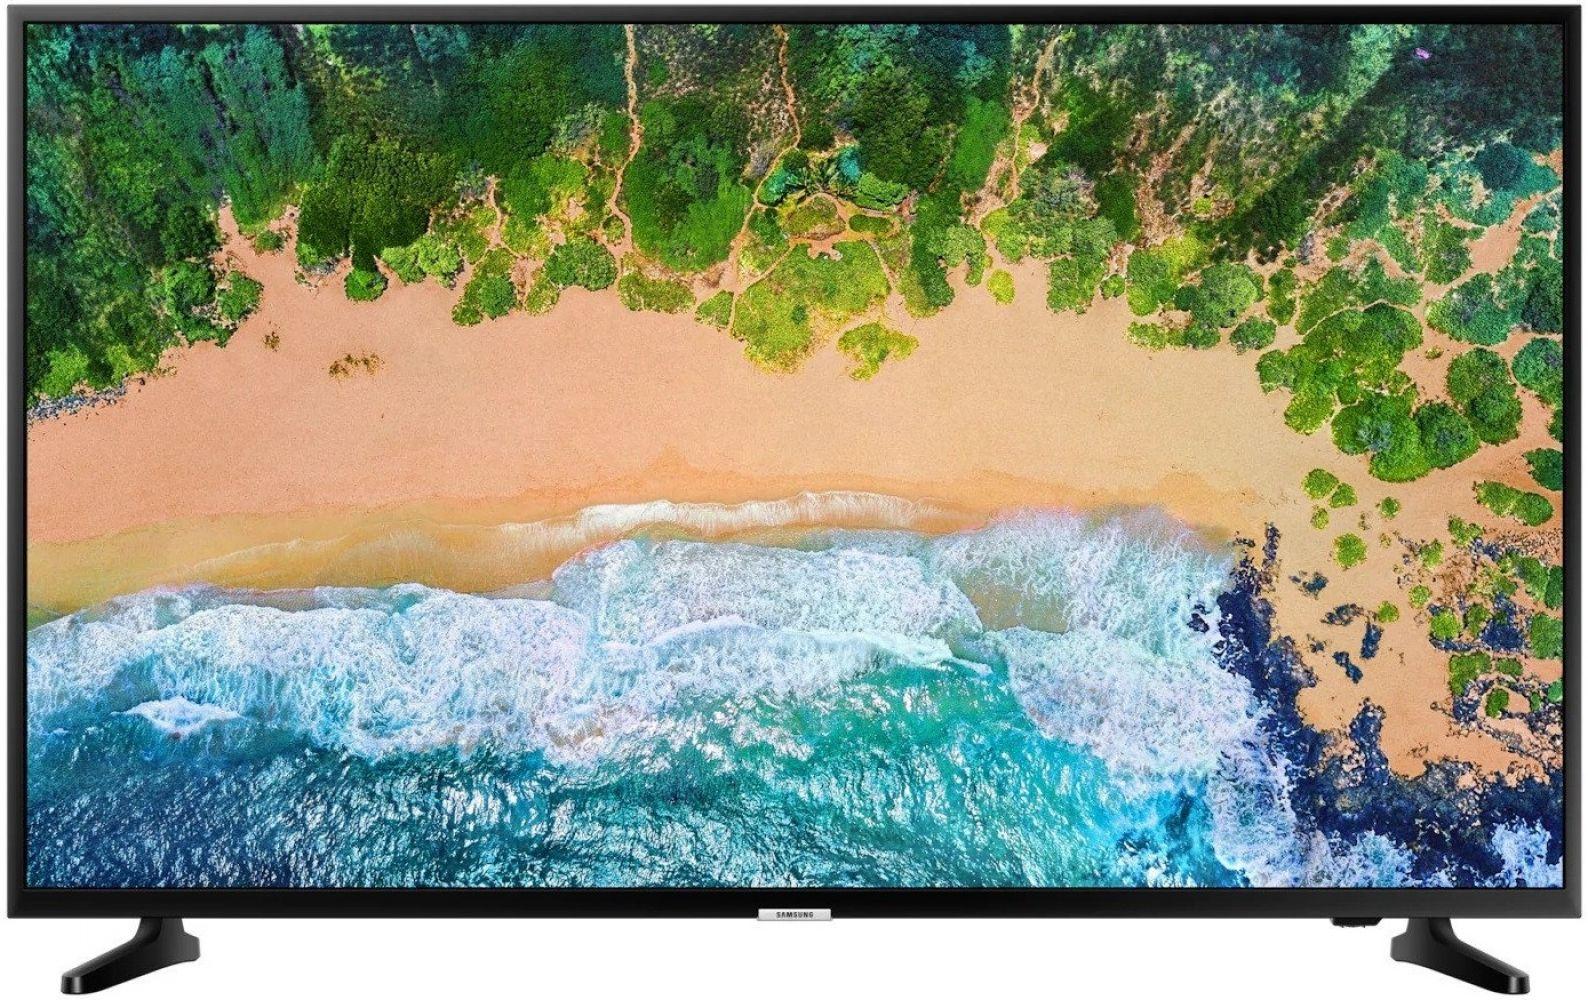 Купить Телевизоры, Телевизор SAMSUNG UE55NU7090UXUA